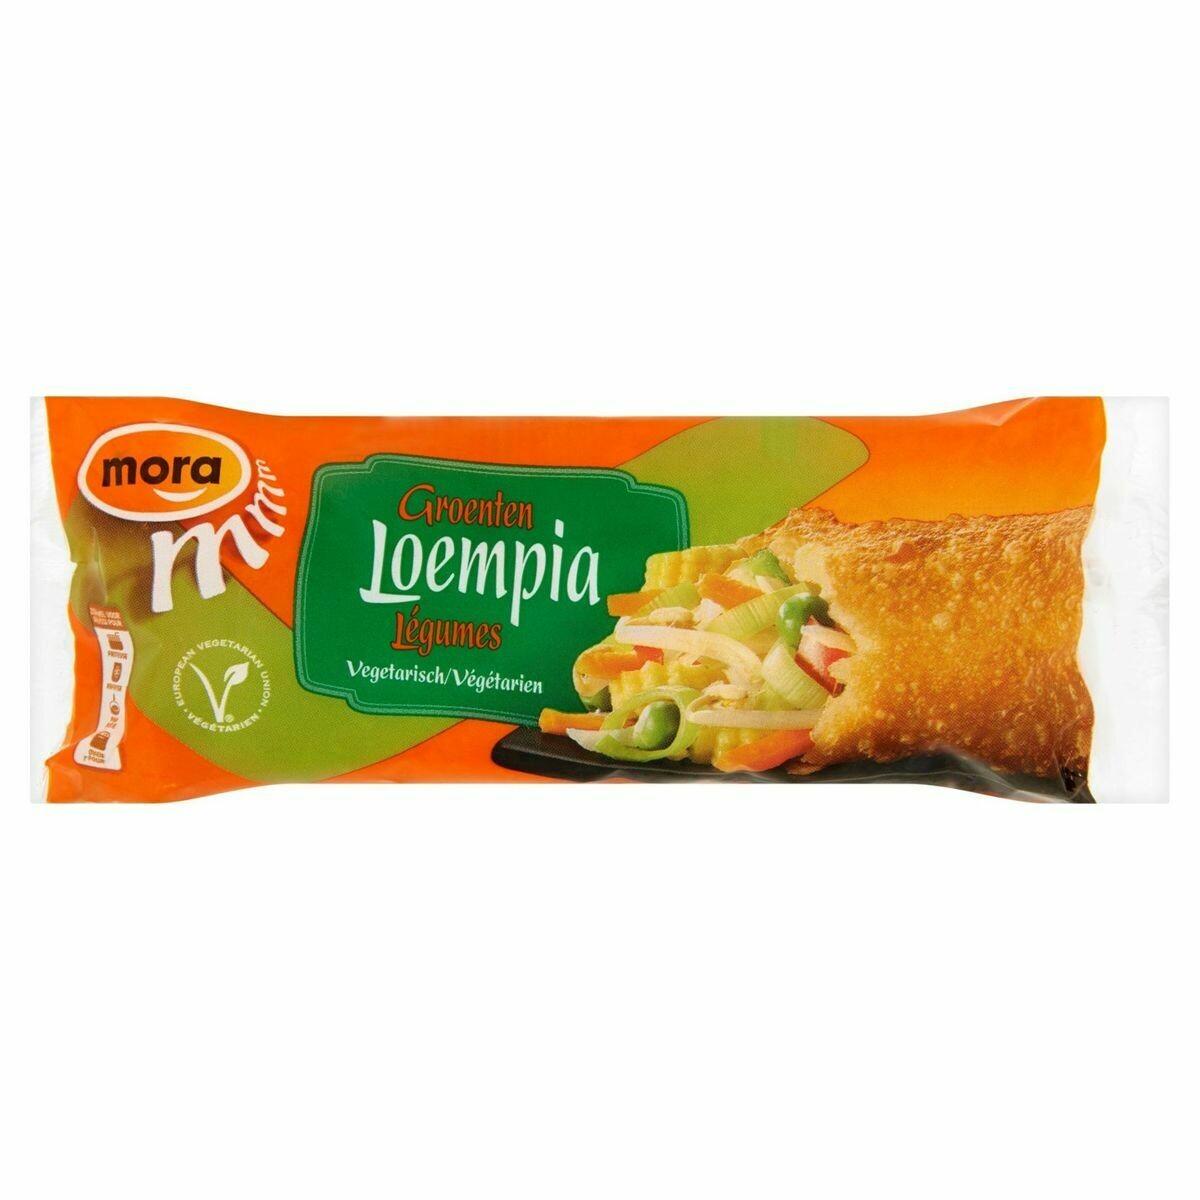 Mora Loepmia Légumes ✅